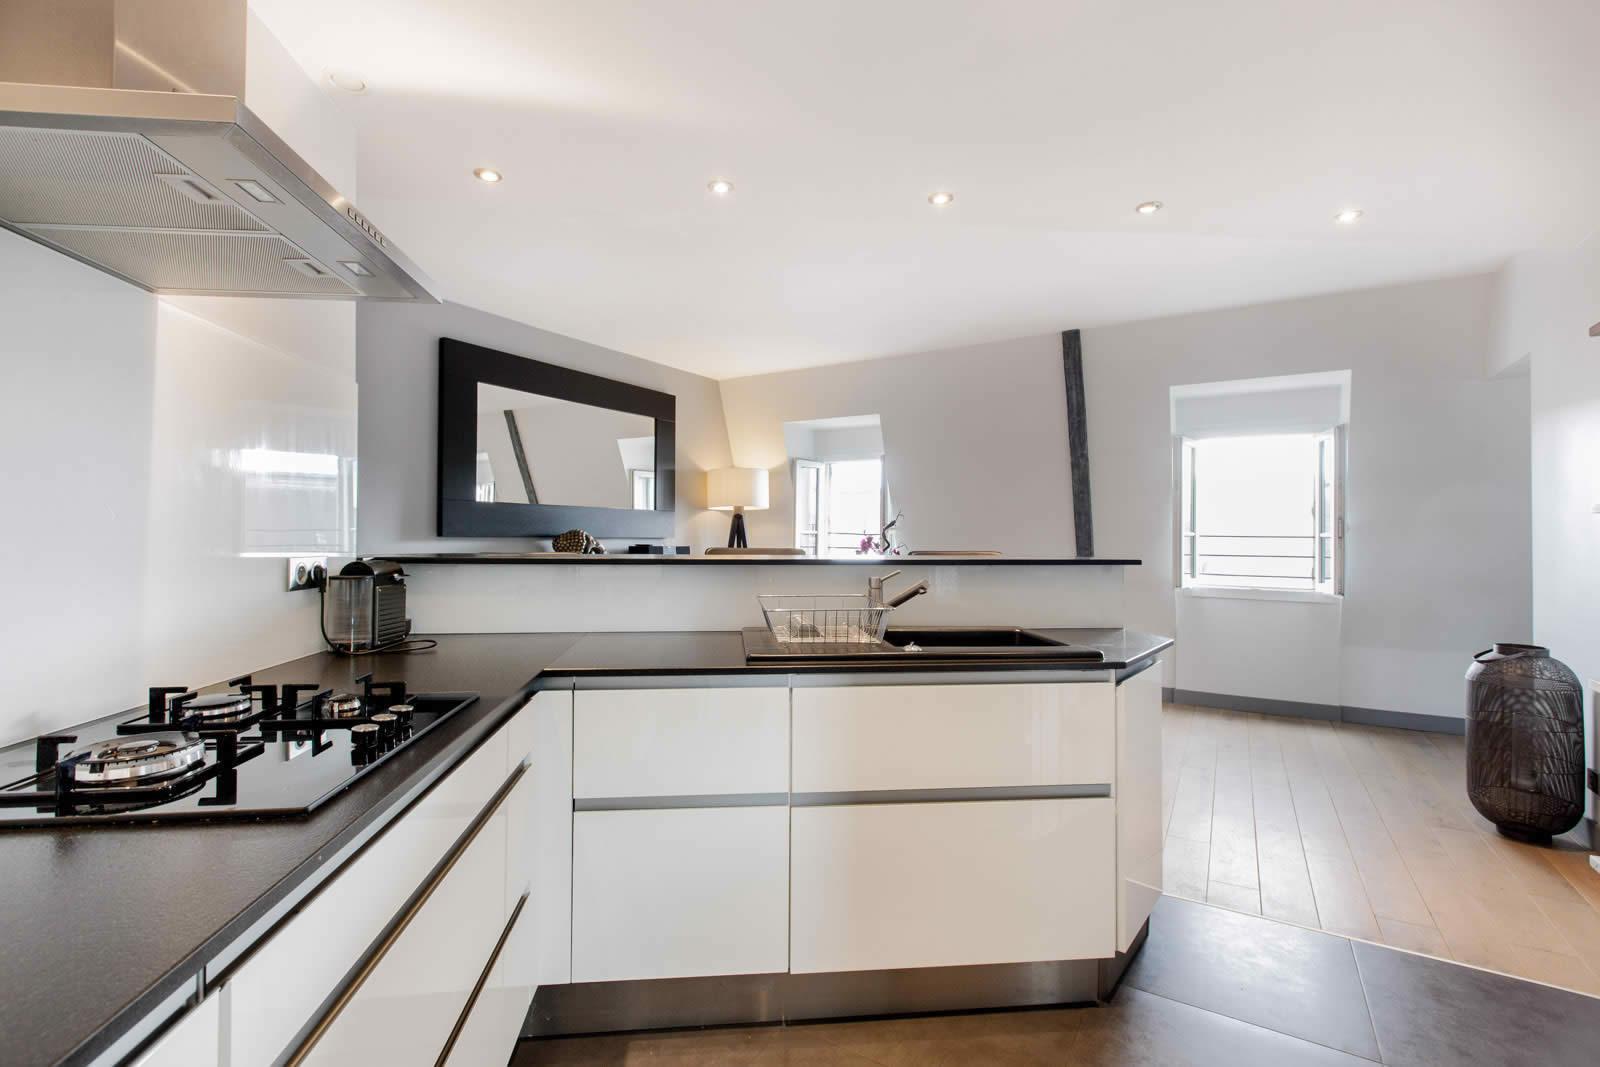 appartement-haussmannien-renove-a-vendre-lumineux-balcon-2-chambres